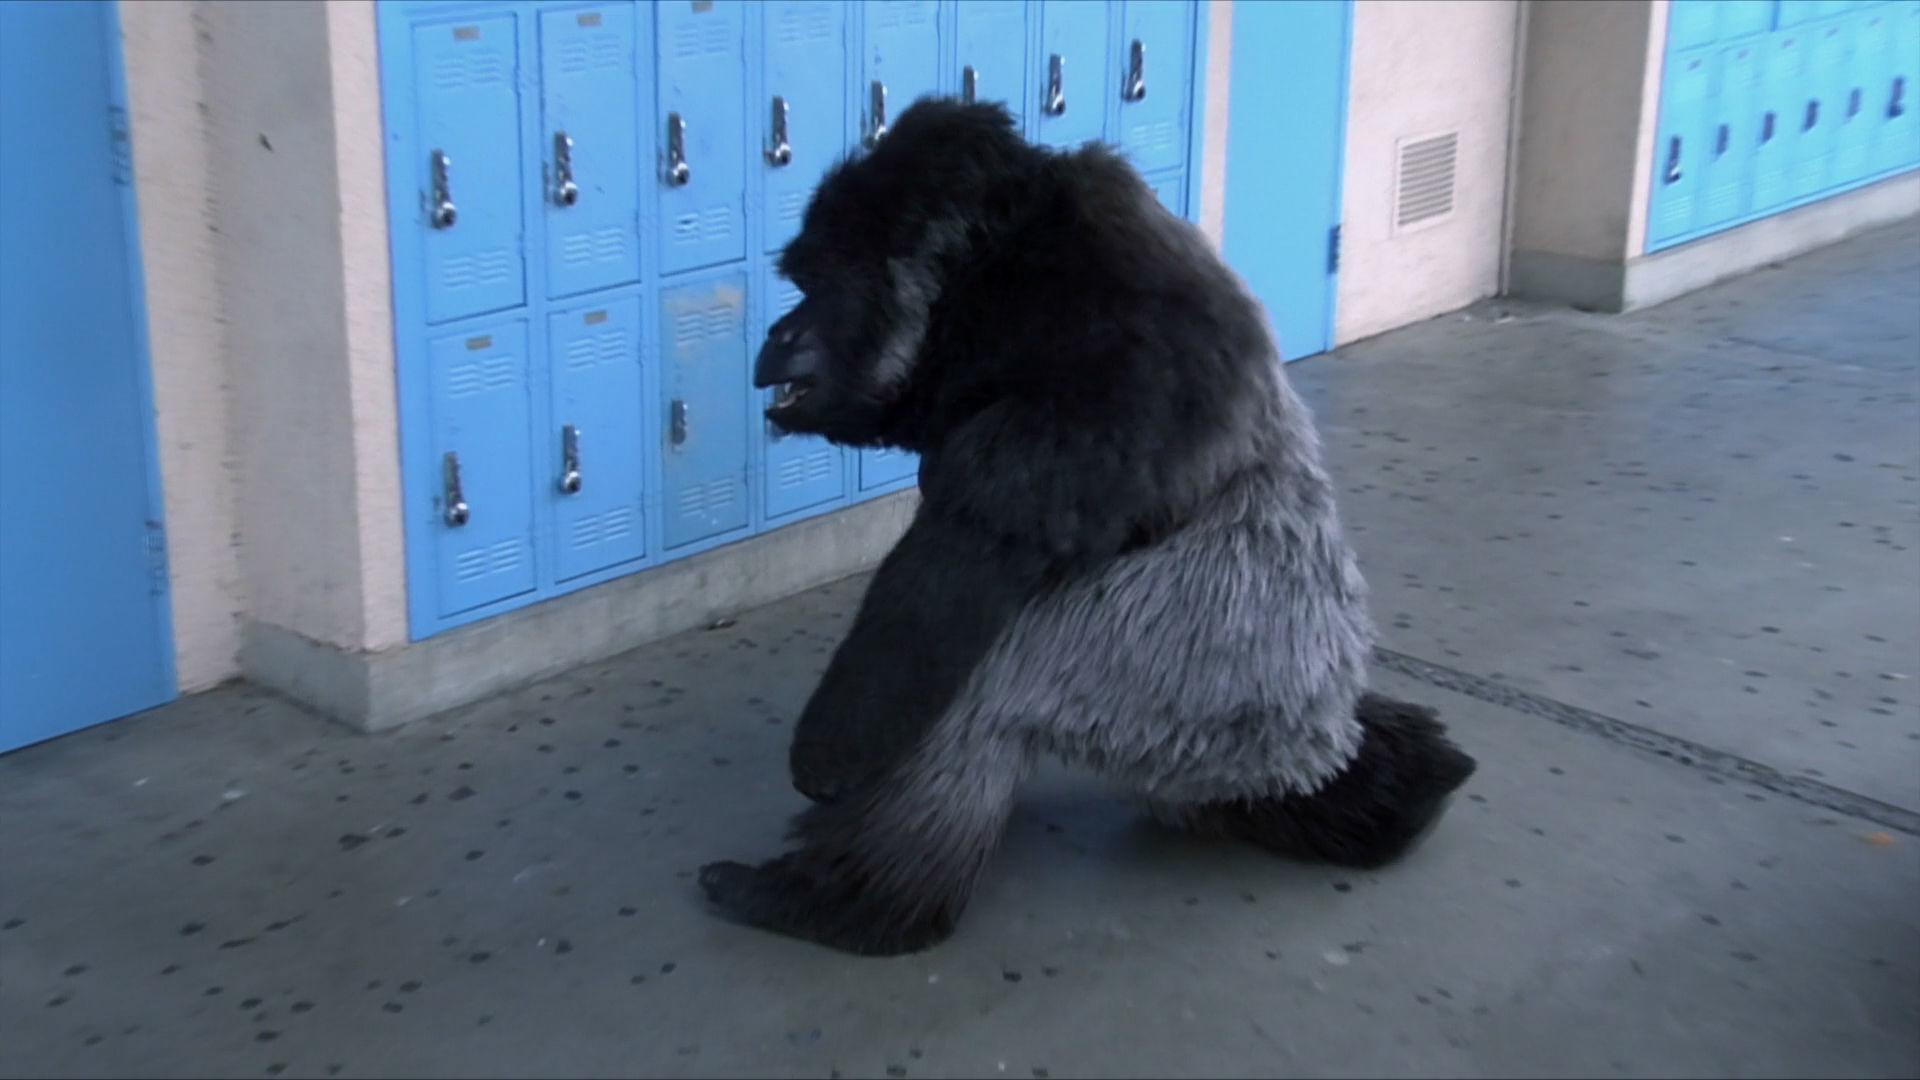 School Gorilla